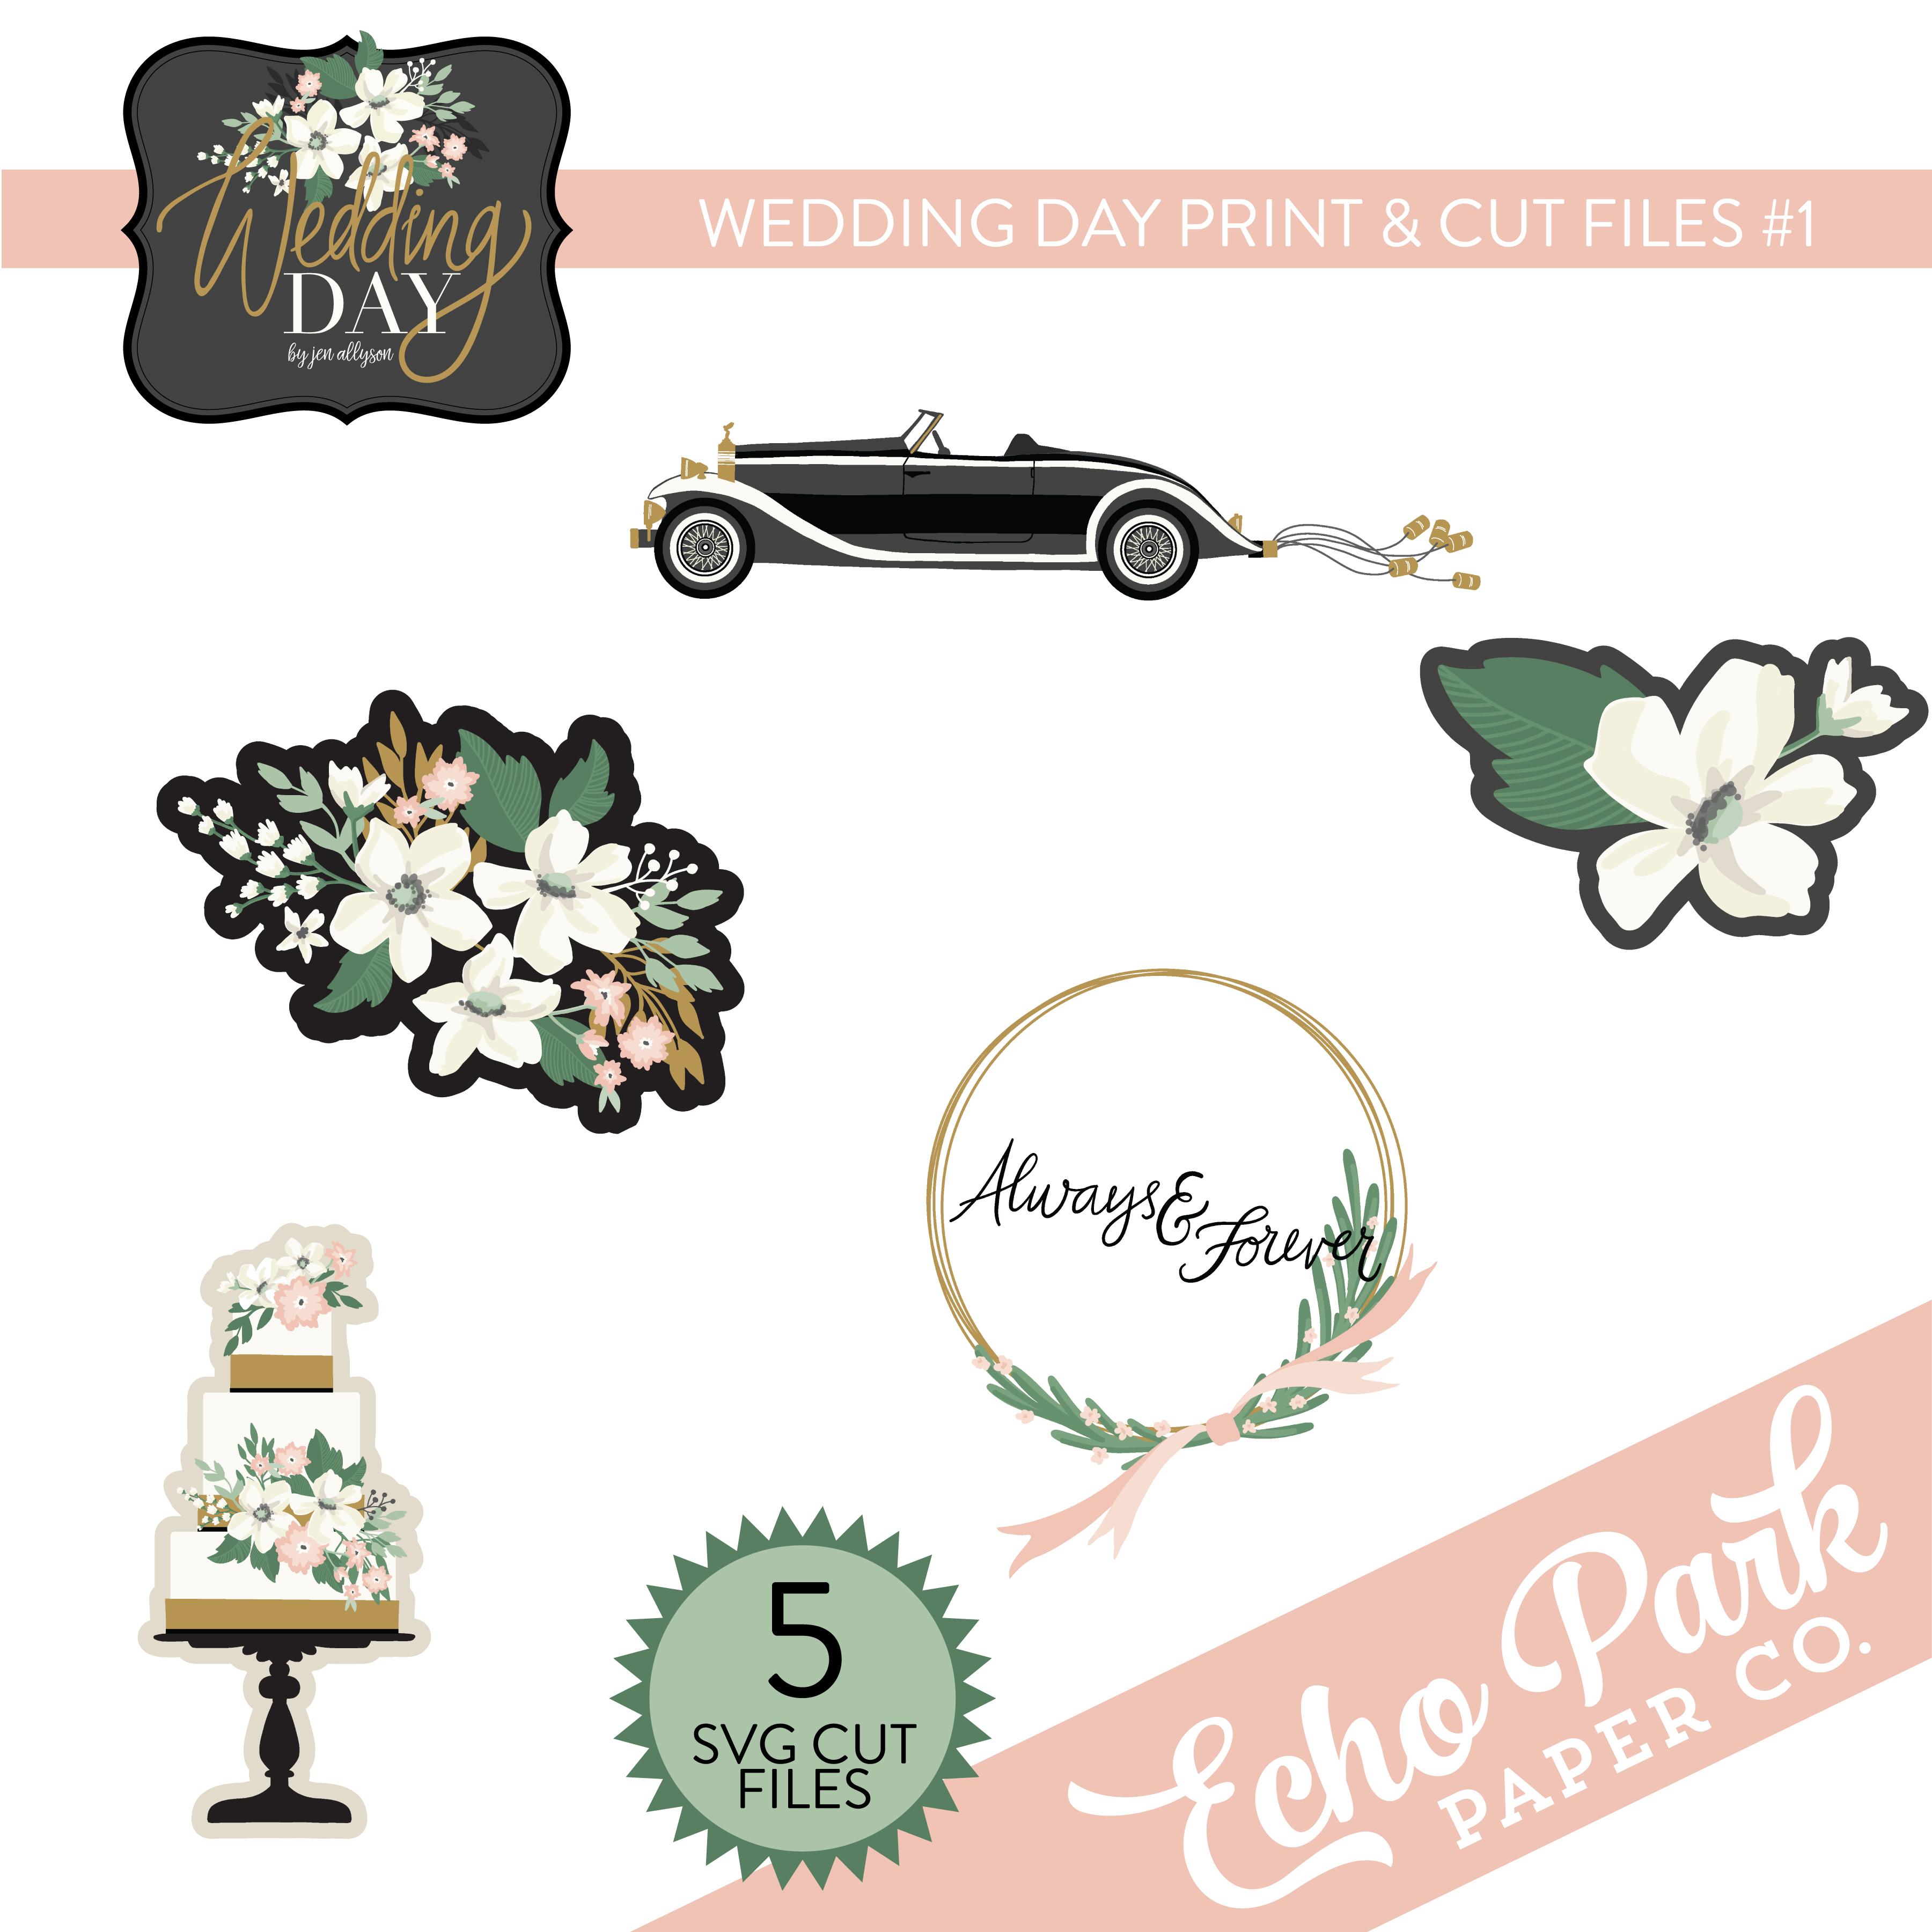 Wedding Day Print & Cut Files #1